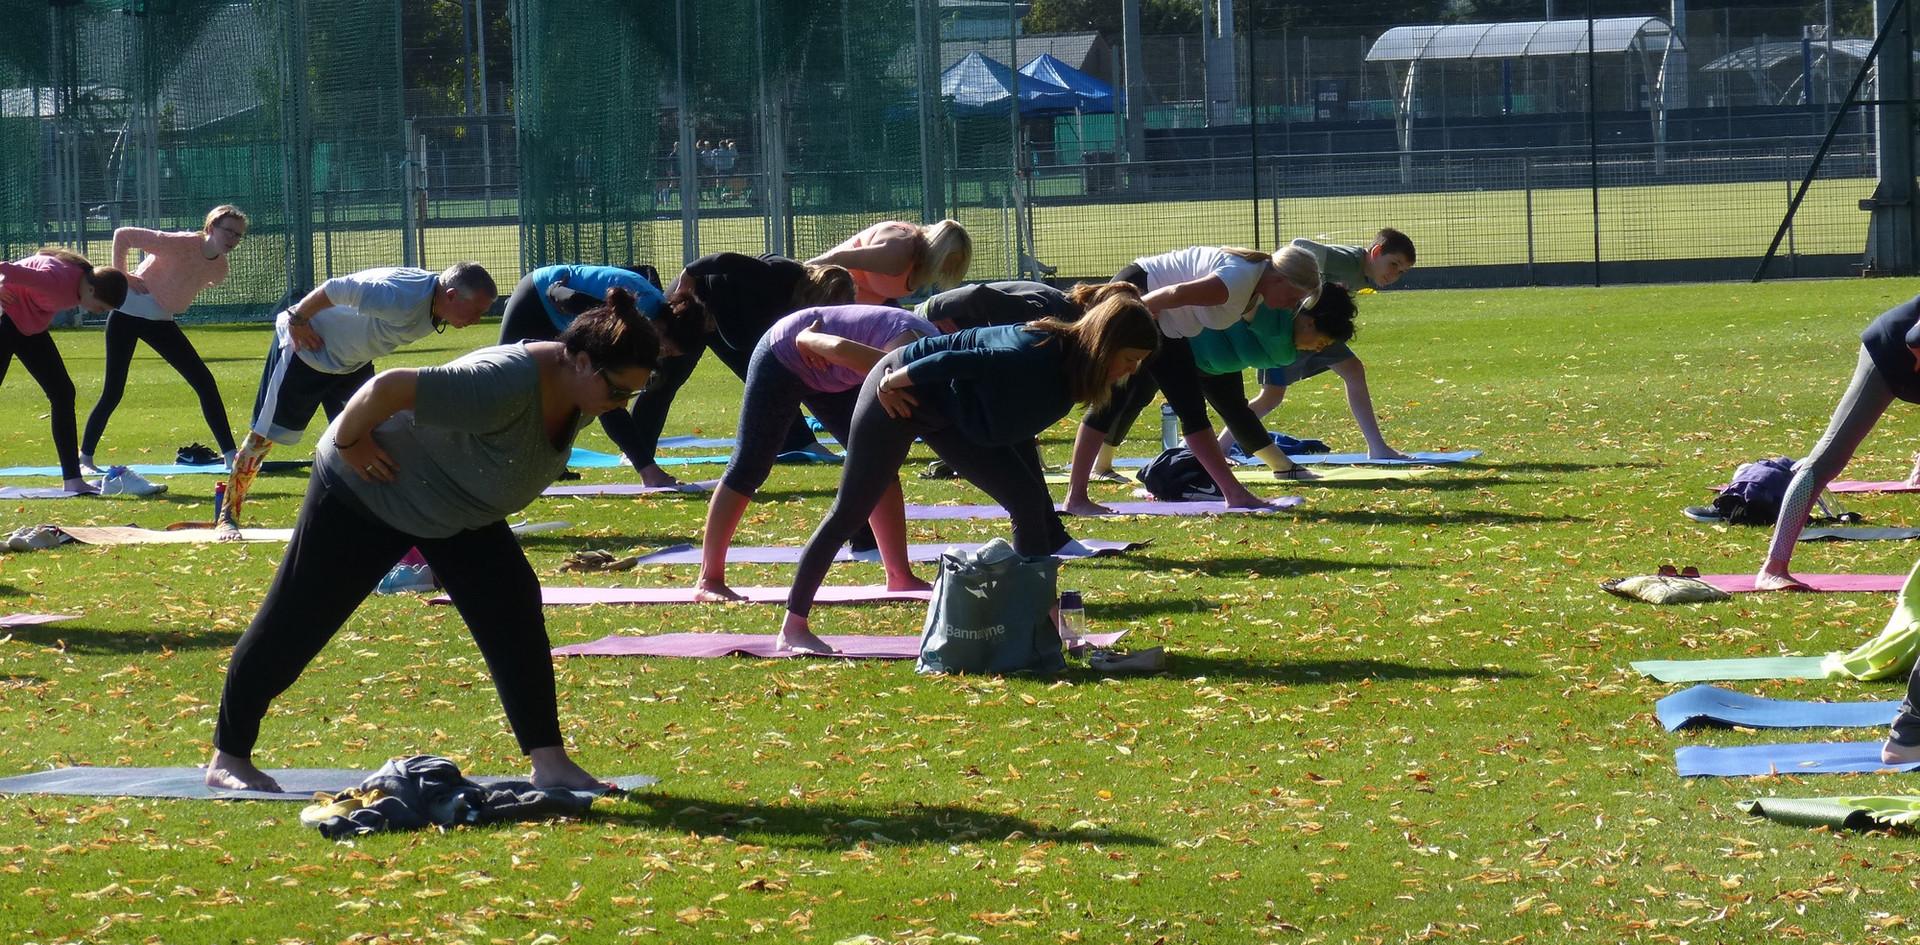 Yoga for Myton Hospice 2019